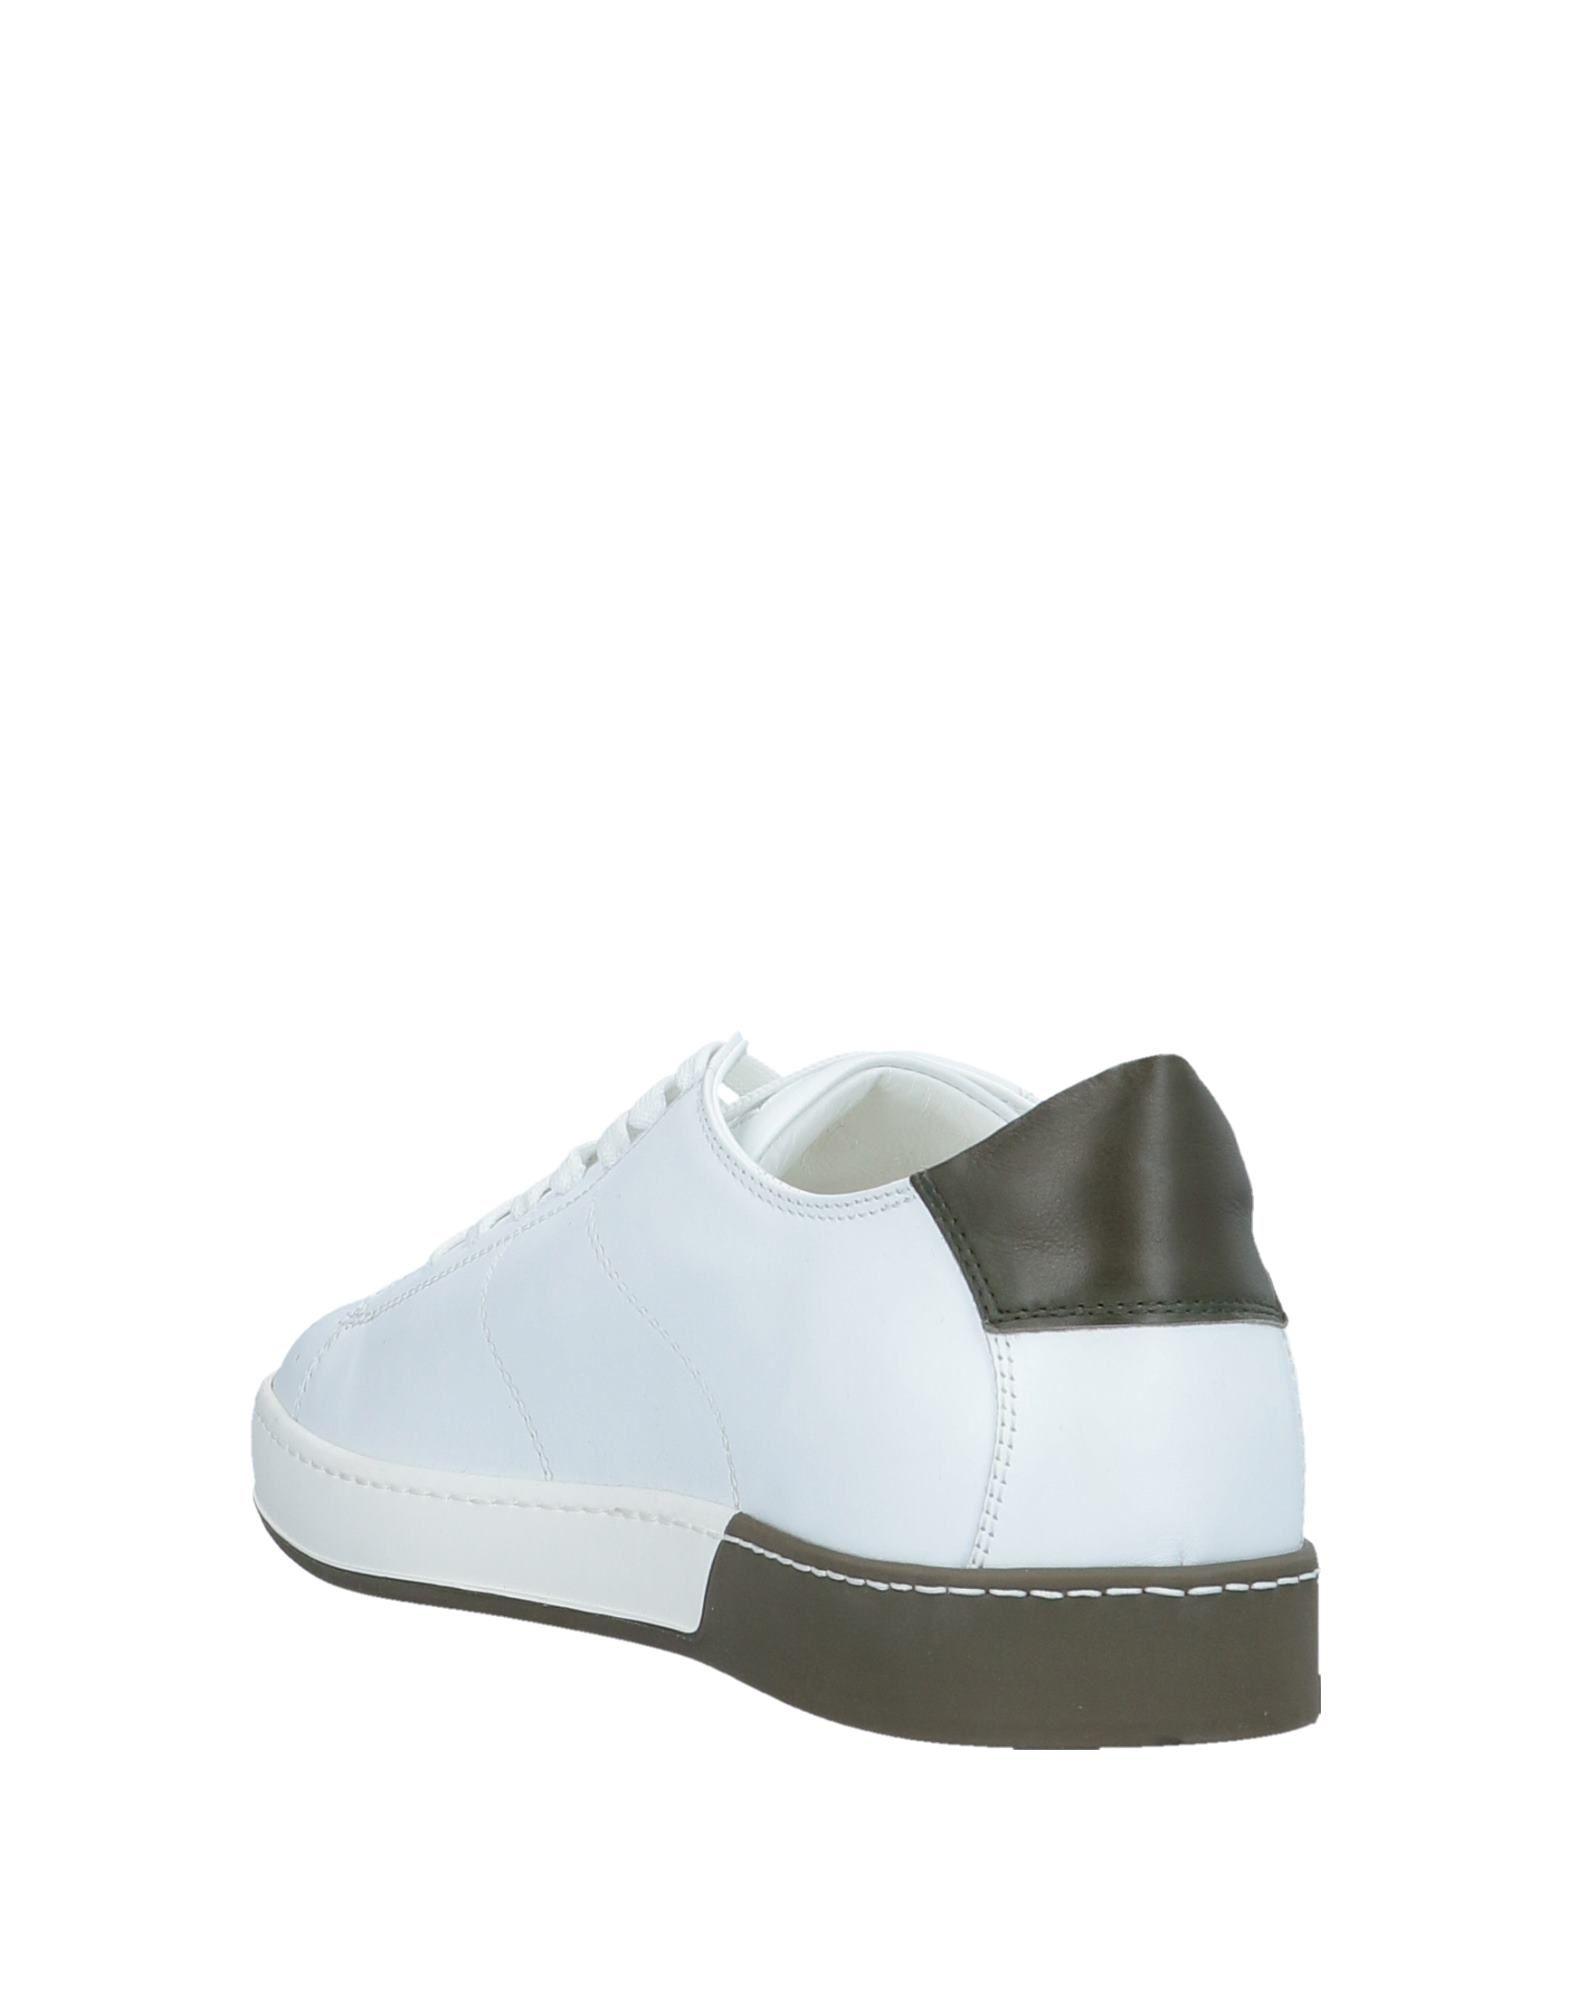 Jil Sander Sneakers Herren  11538913AP Gute Qualität beliebte Schuhe